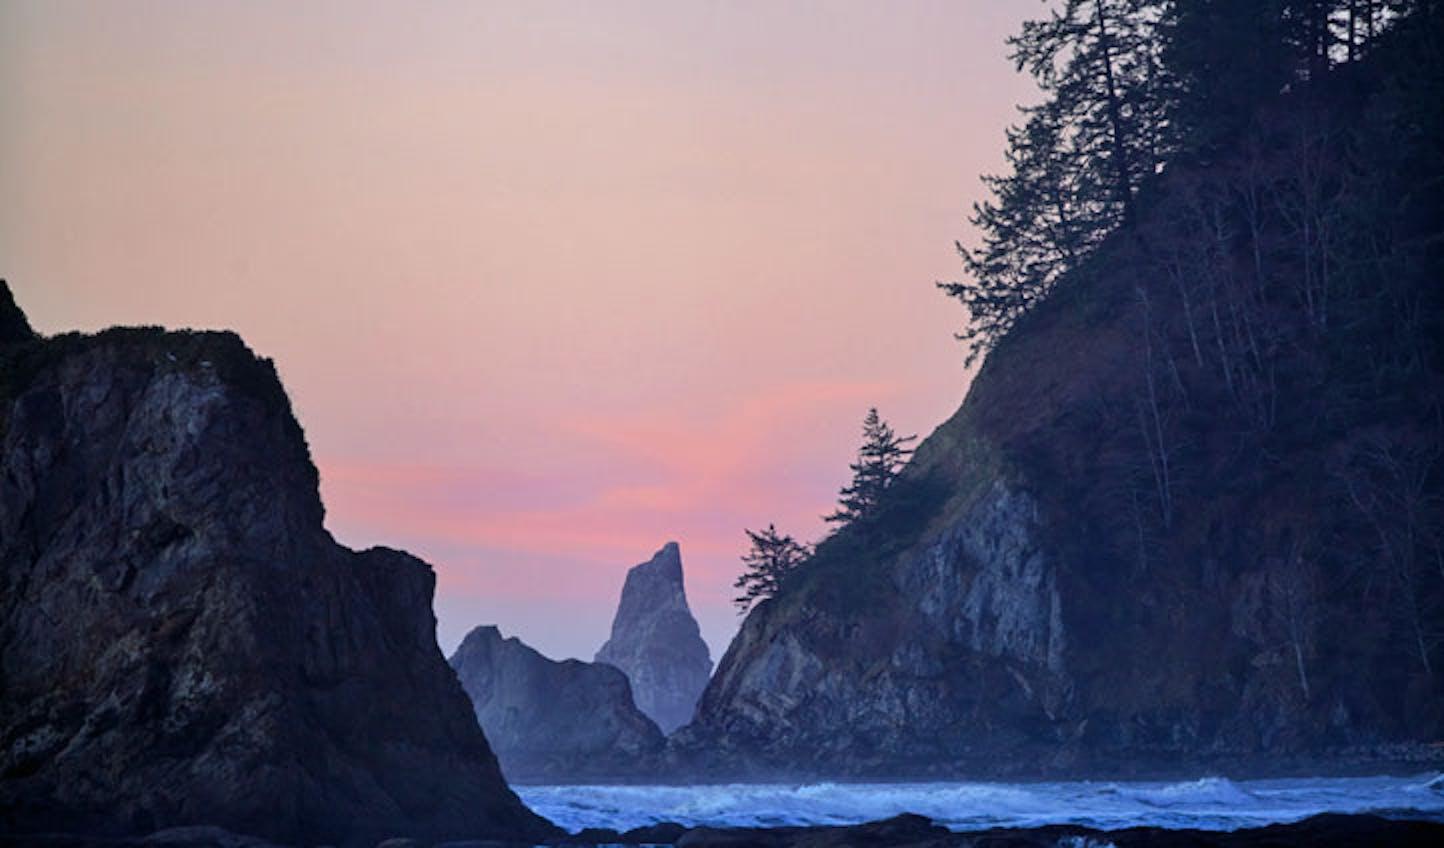 A beach in Washington State